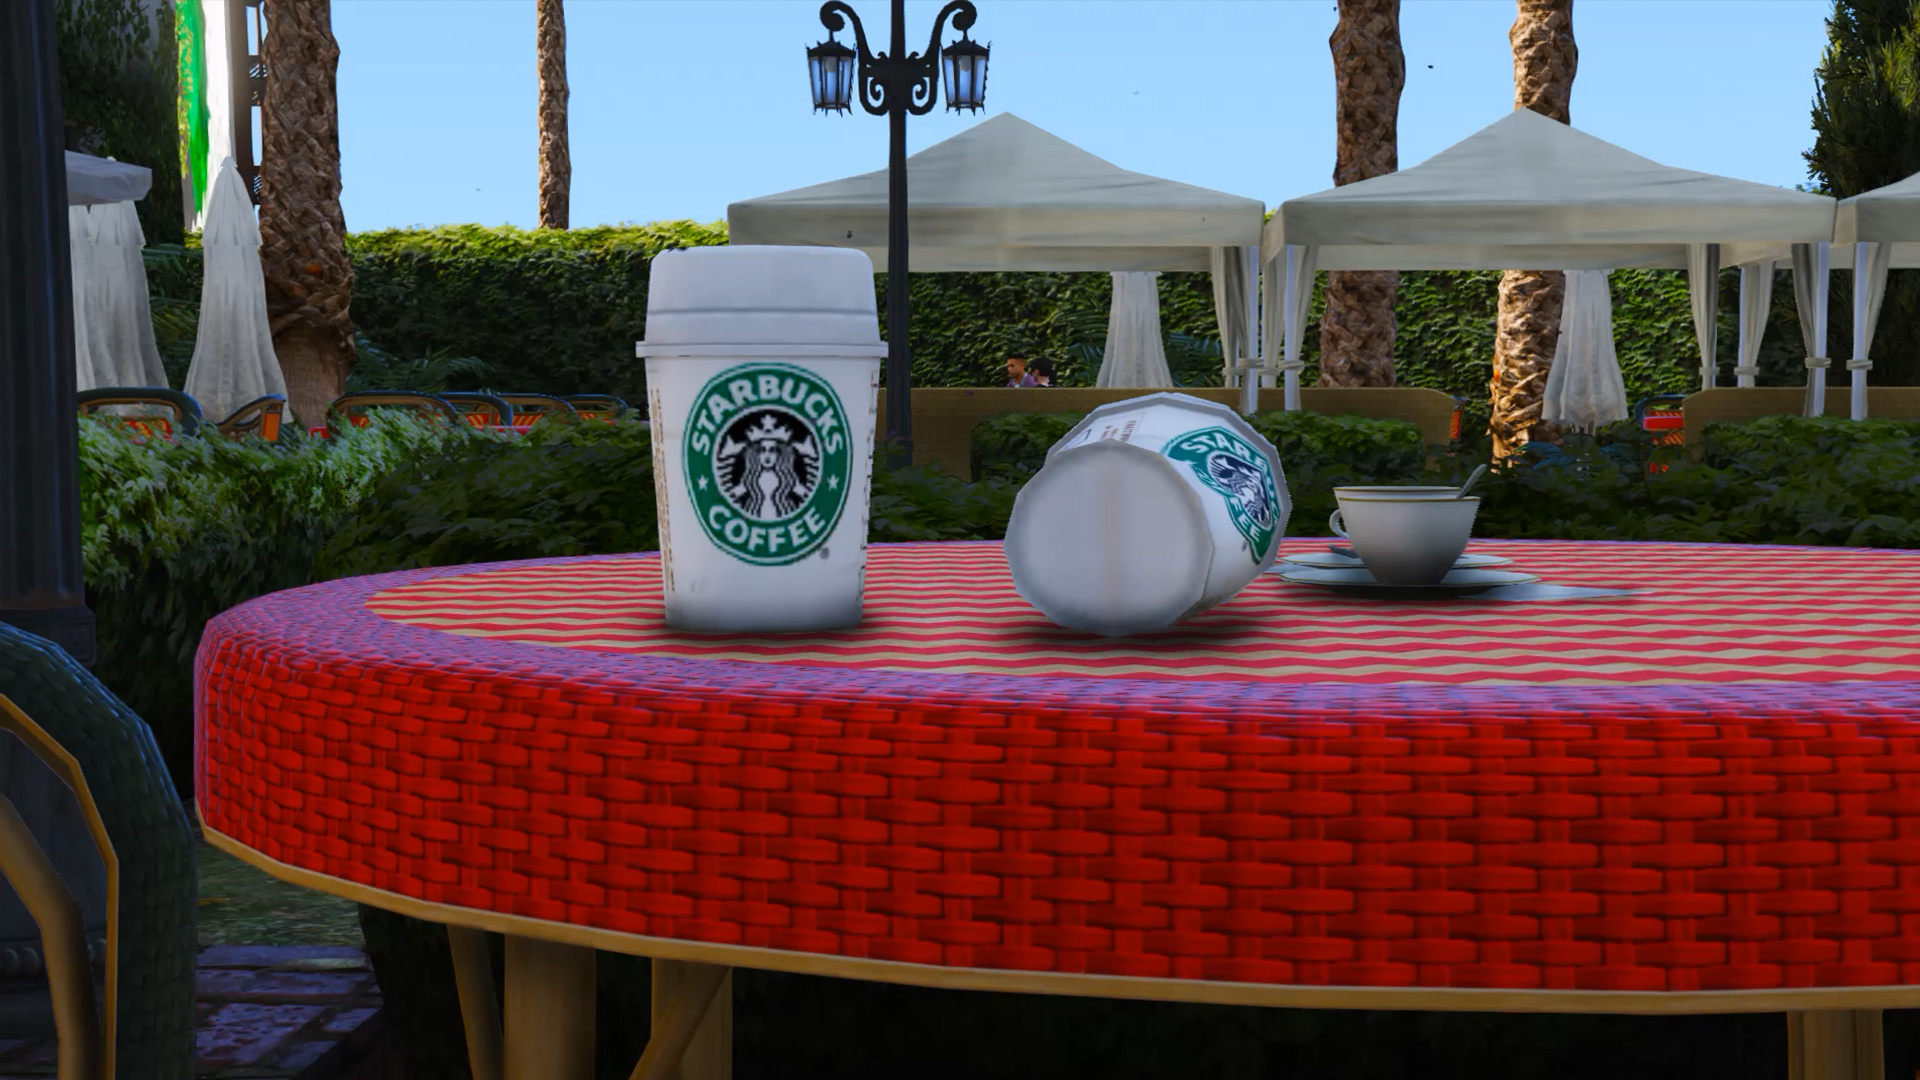 Starbucks Coffee GTA5 Mods